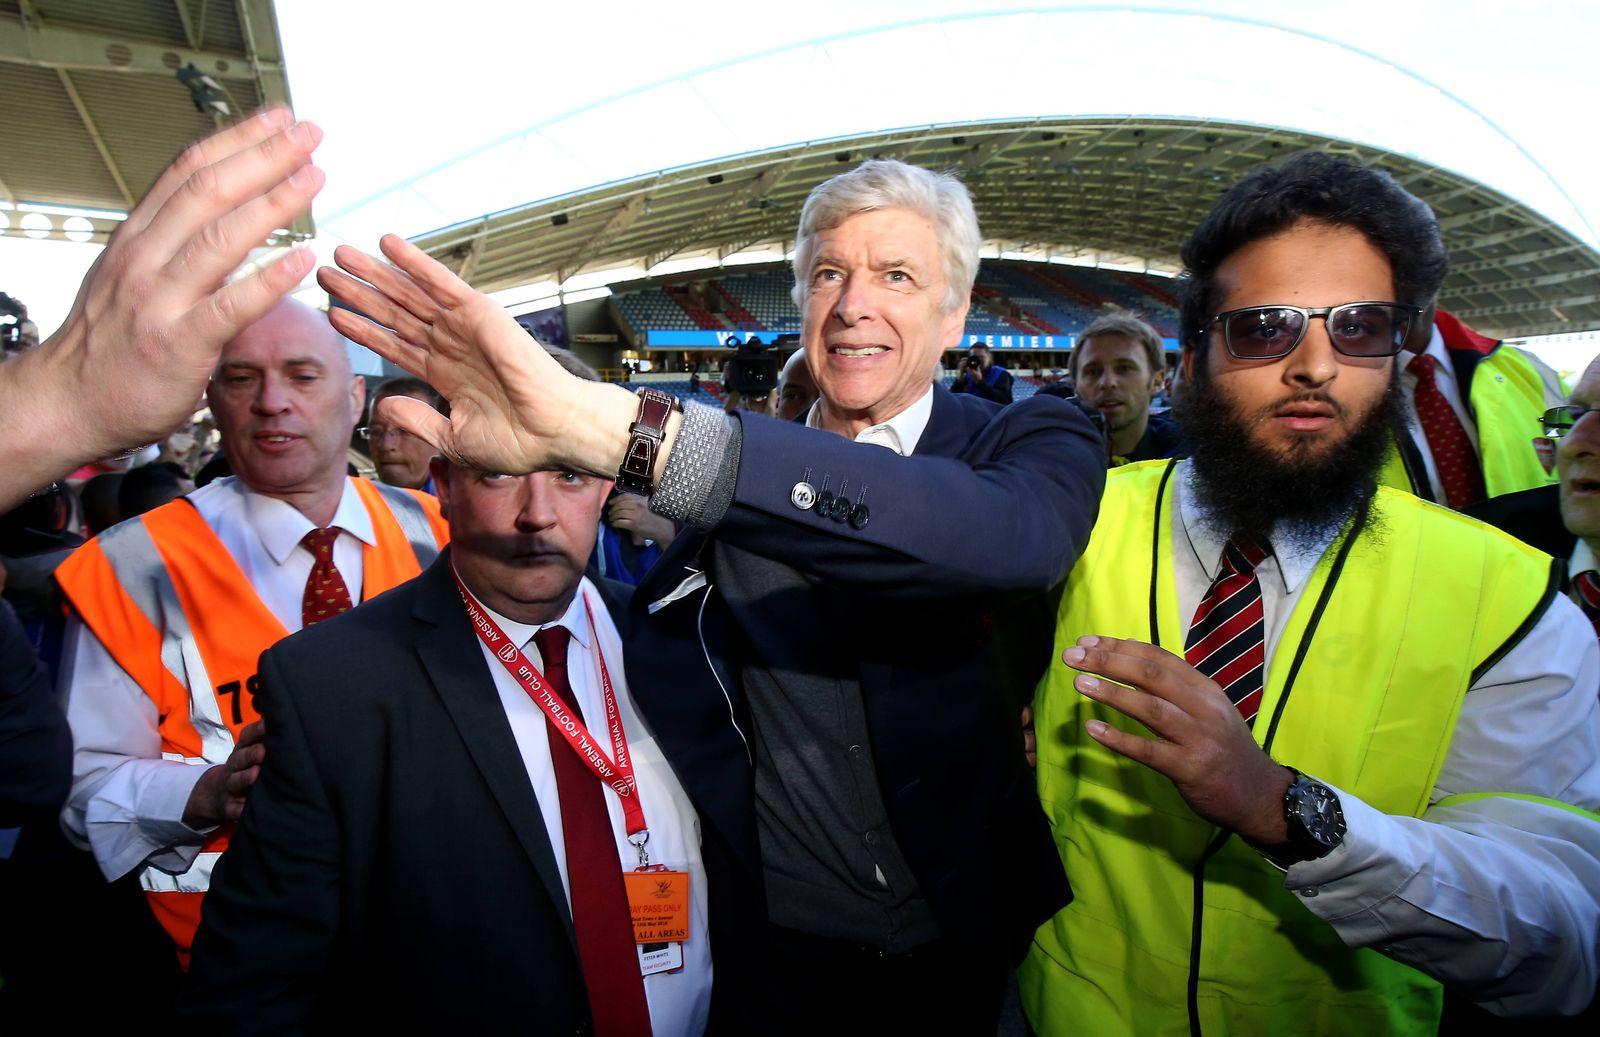 Huddersfield Town v Arsenal Premier League John Smith s Stadium Outgoing Arsenal manager Arsene